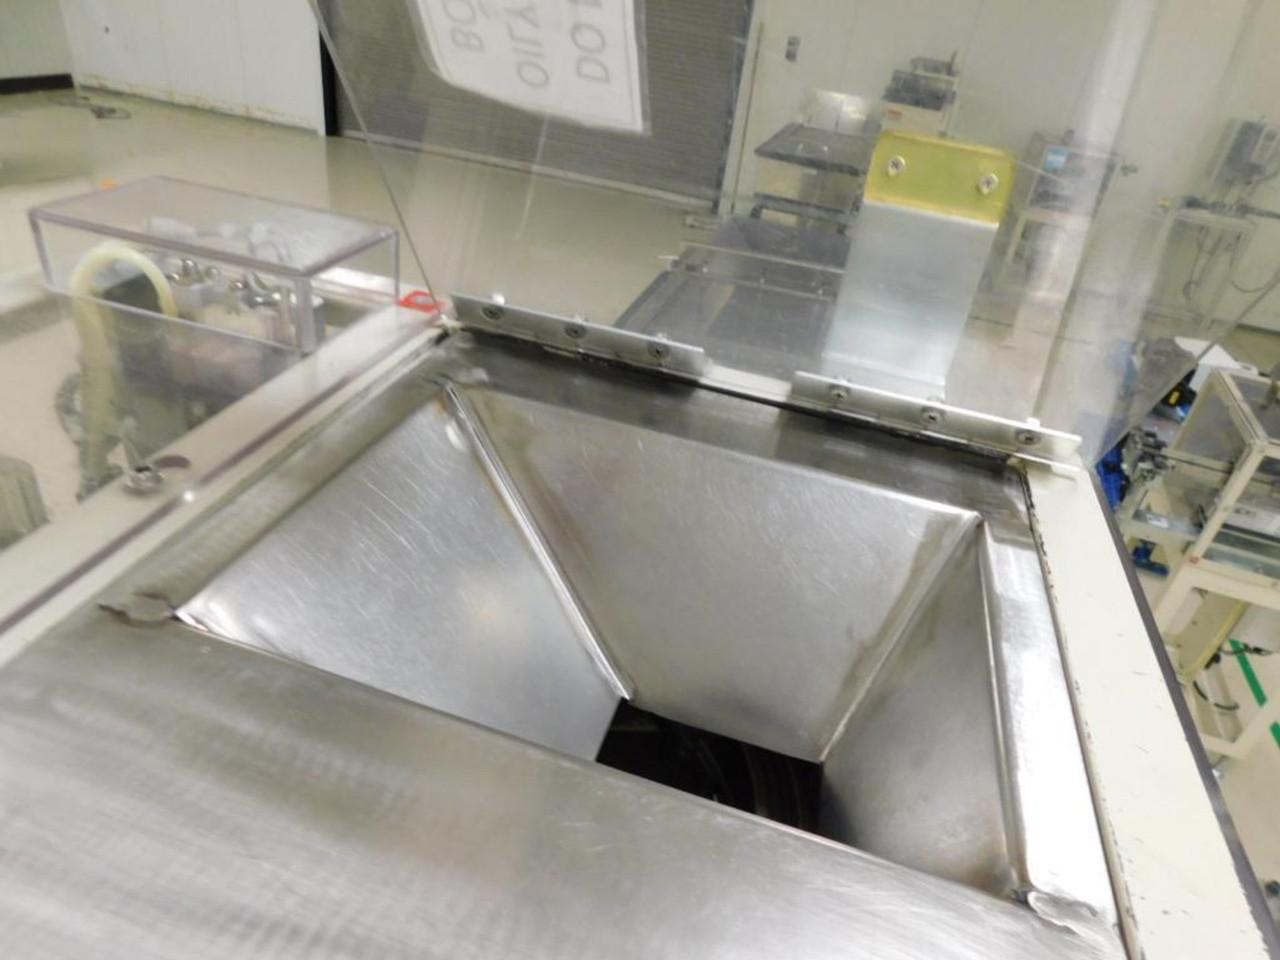 NTN Vibratory Bowl Feeder, Model K16 with a model K-ECA46 controller